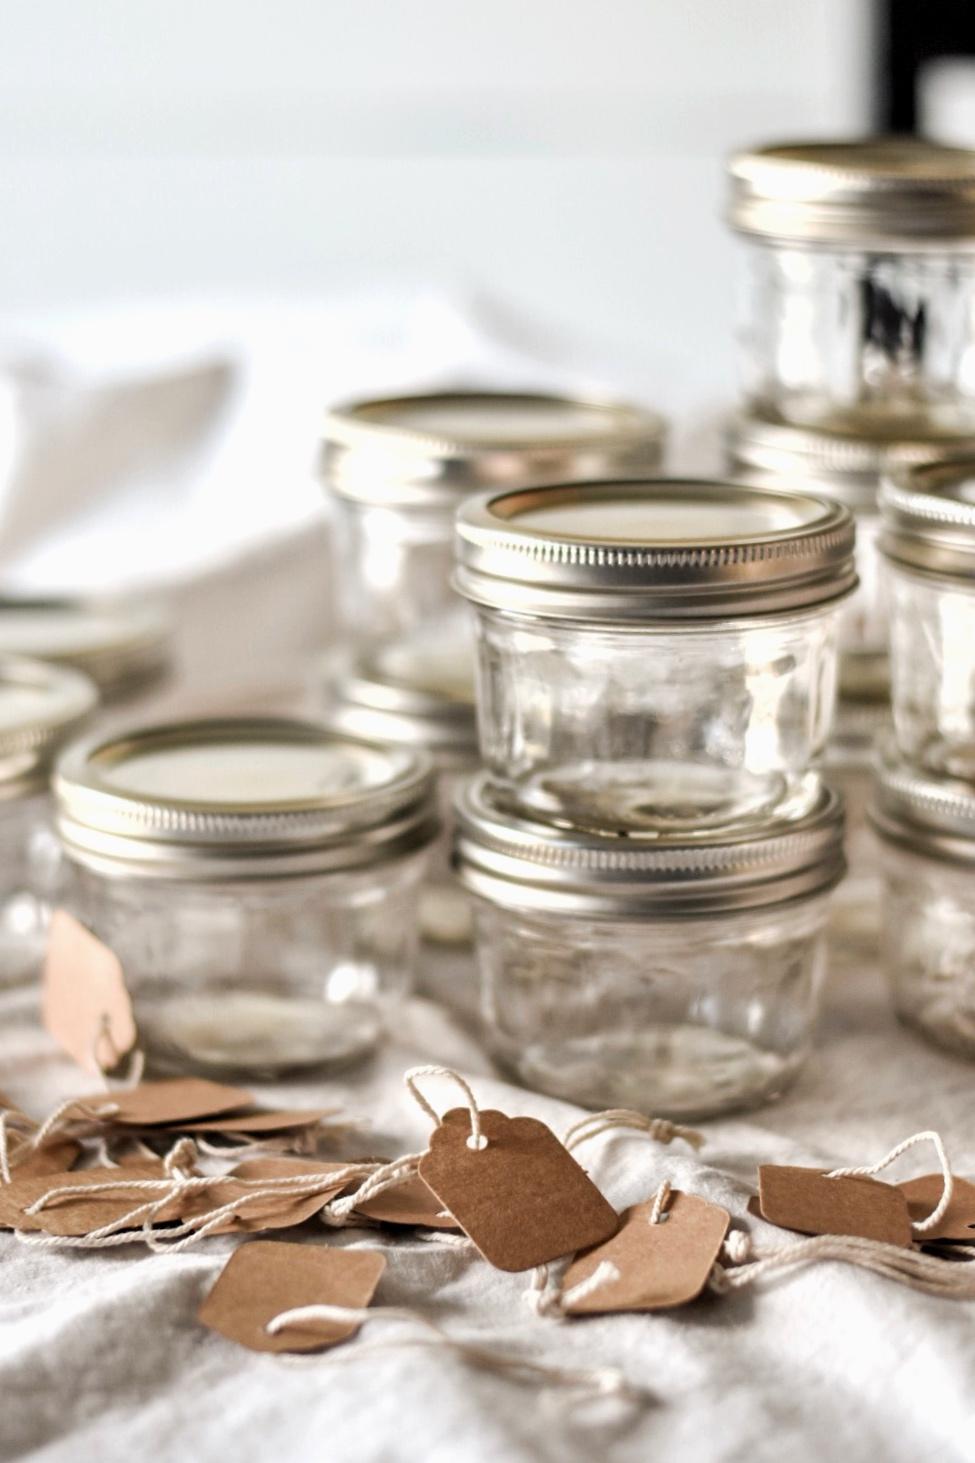 Mason jar spice and herb storage organziation - Rocky Hedge Farm